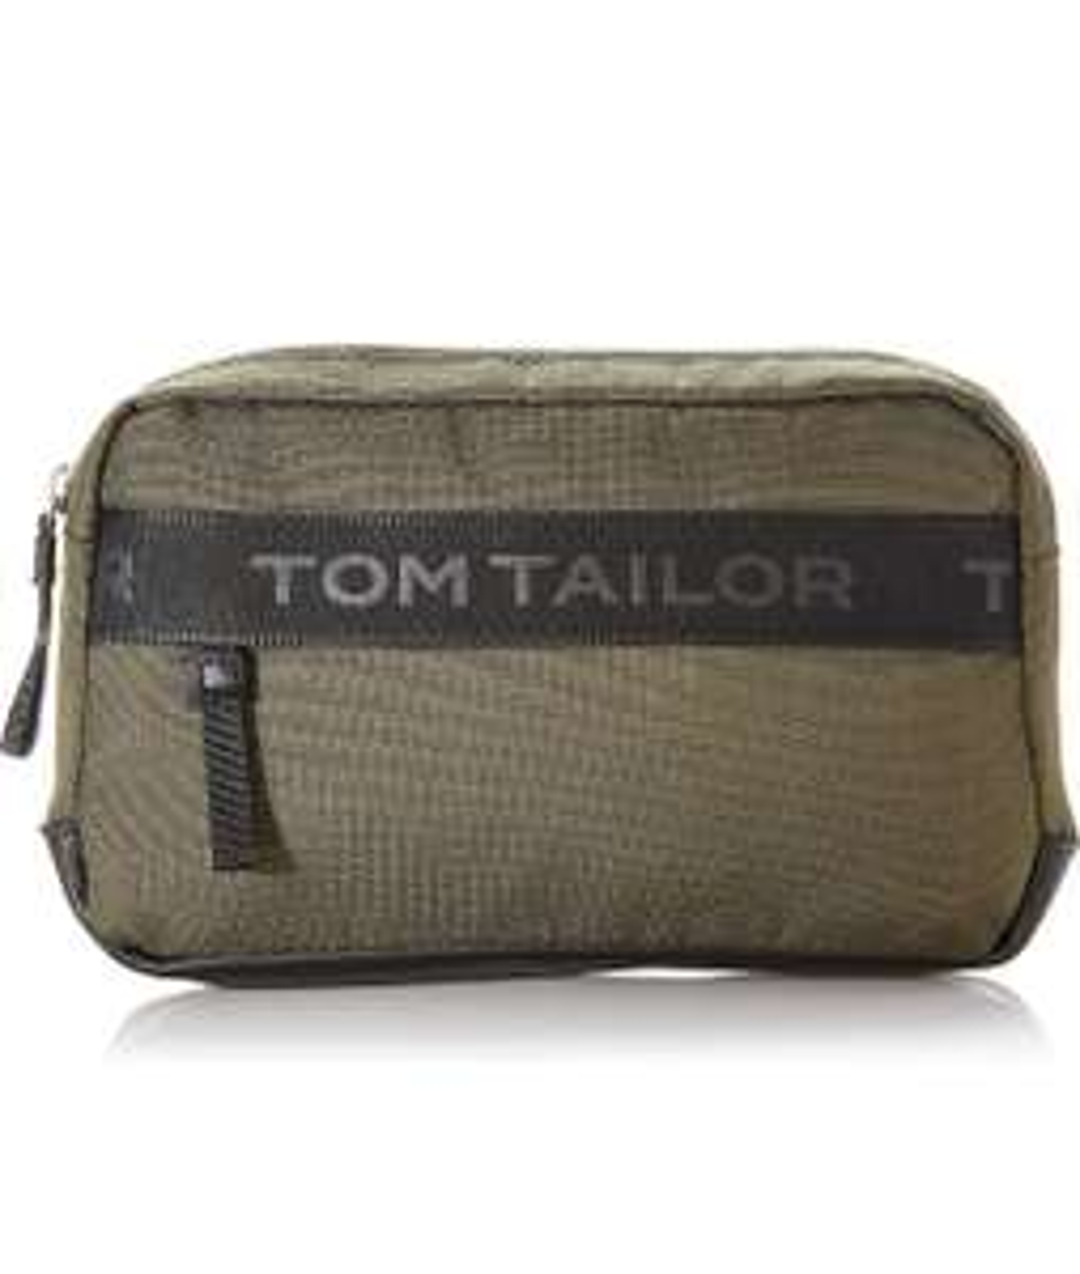 Tom Tailor Heuptasje groen (khaki)